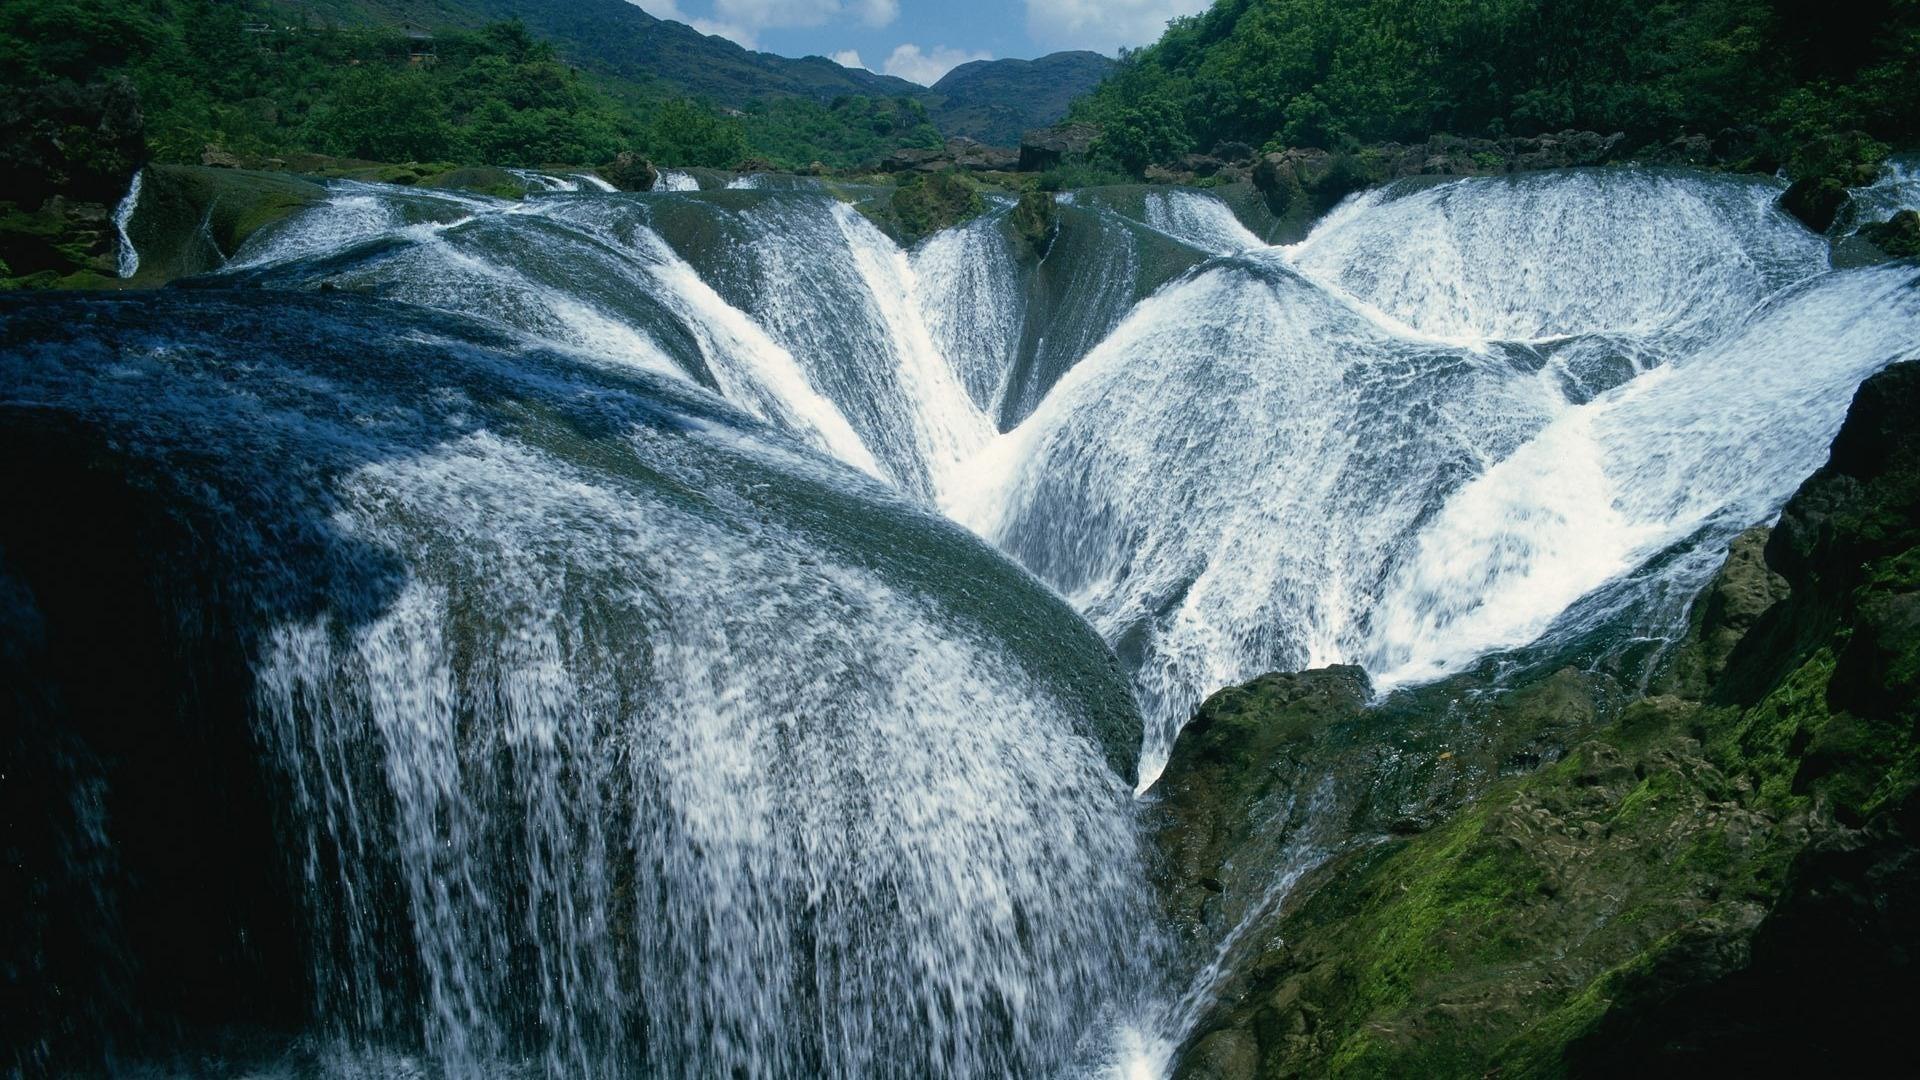 waterfall desktop backgrounds 62 images